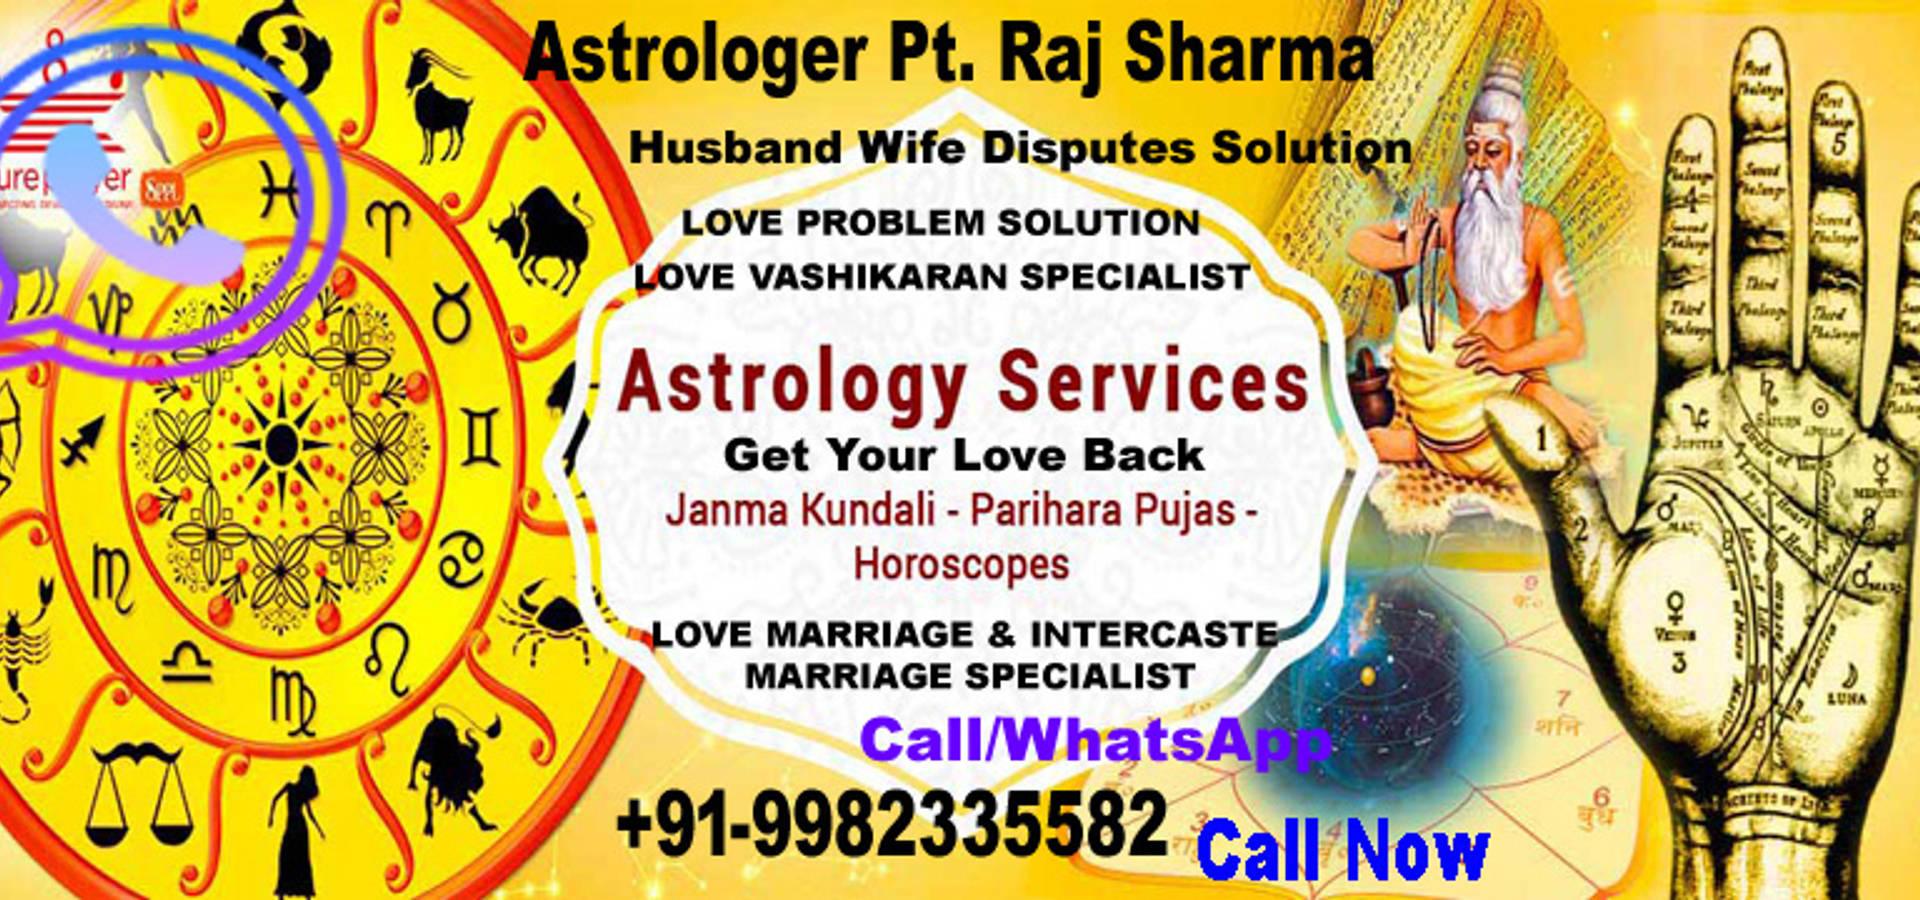 love vashikaran specialist bhole baba